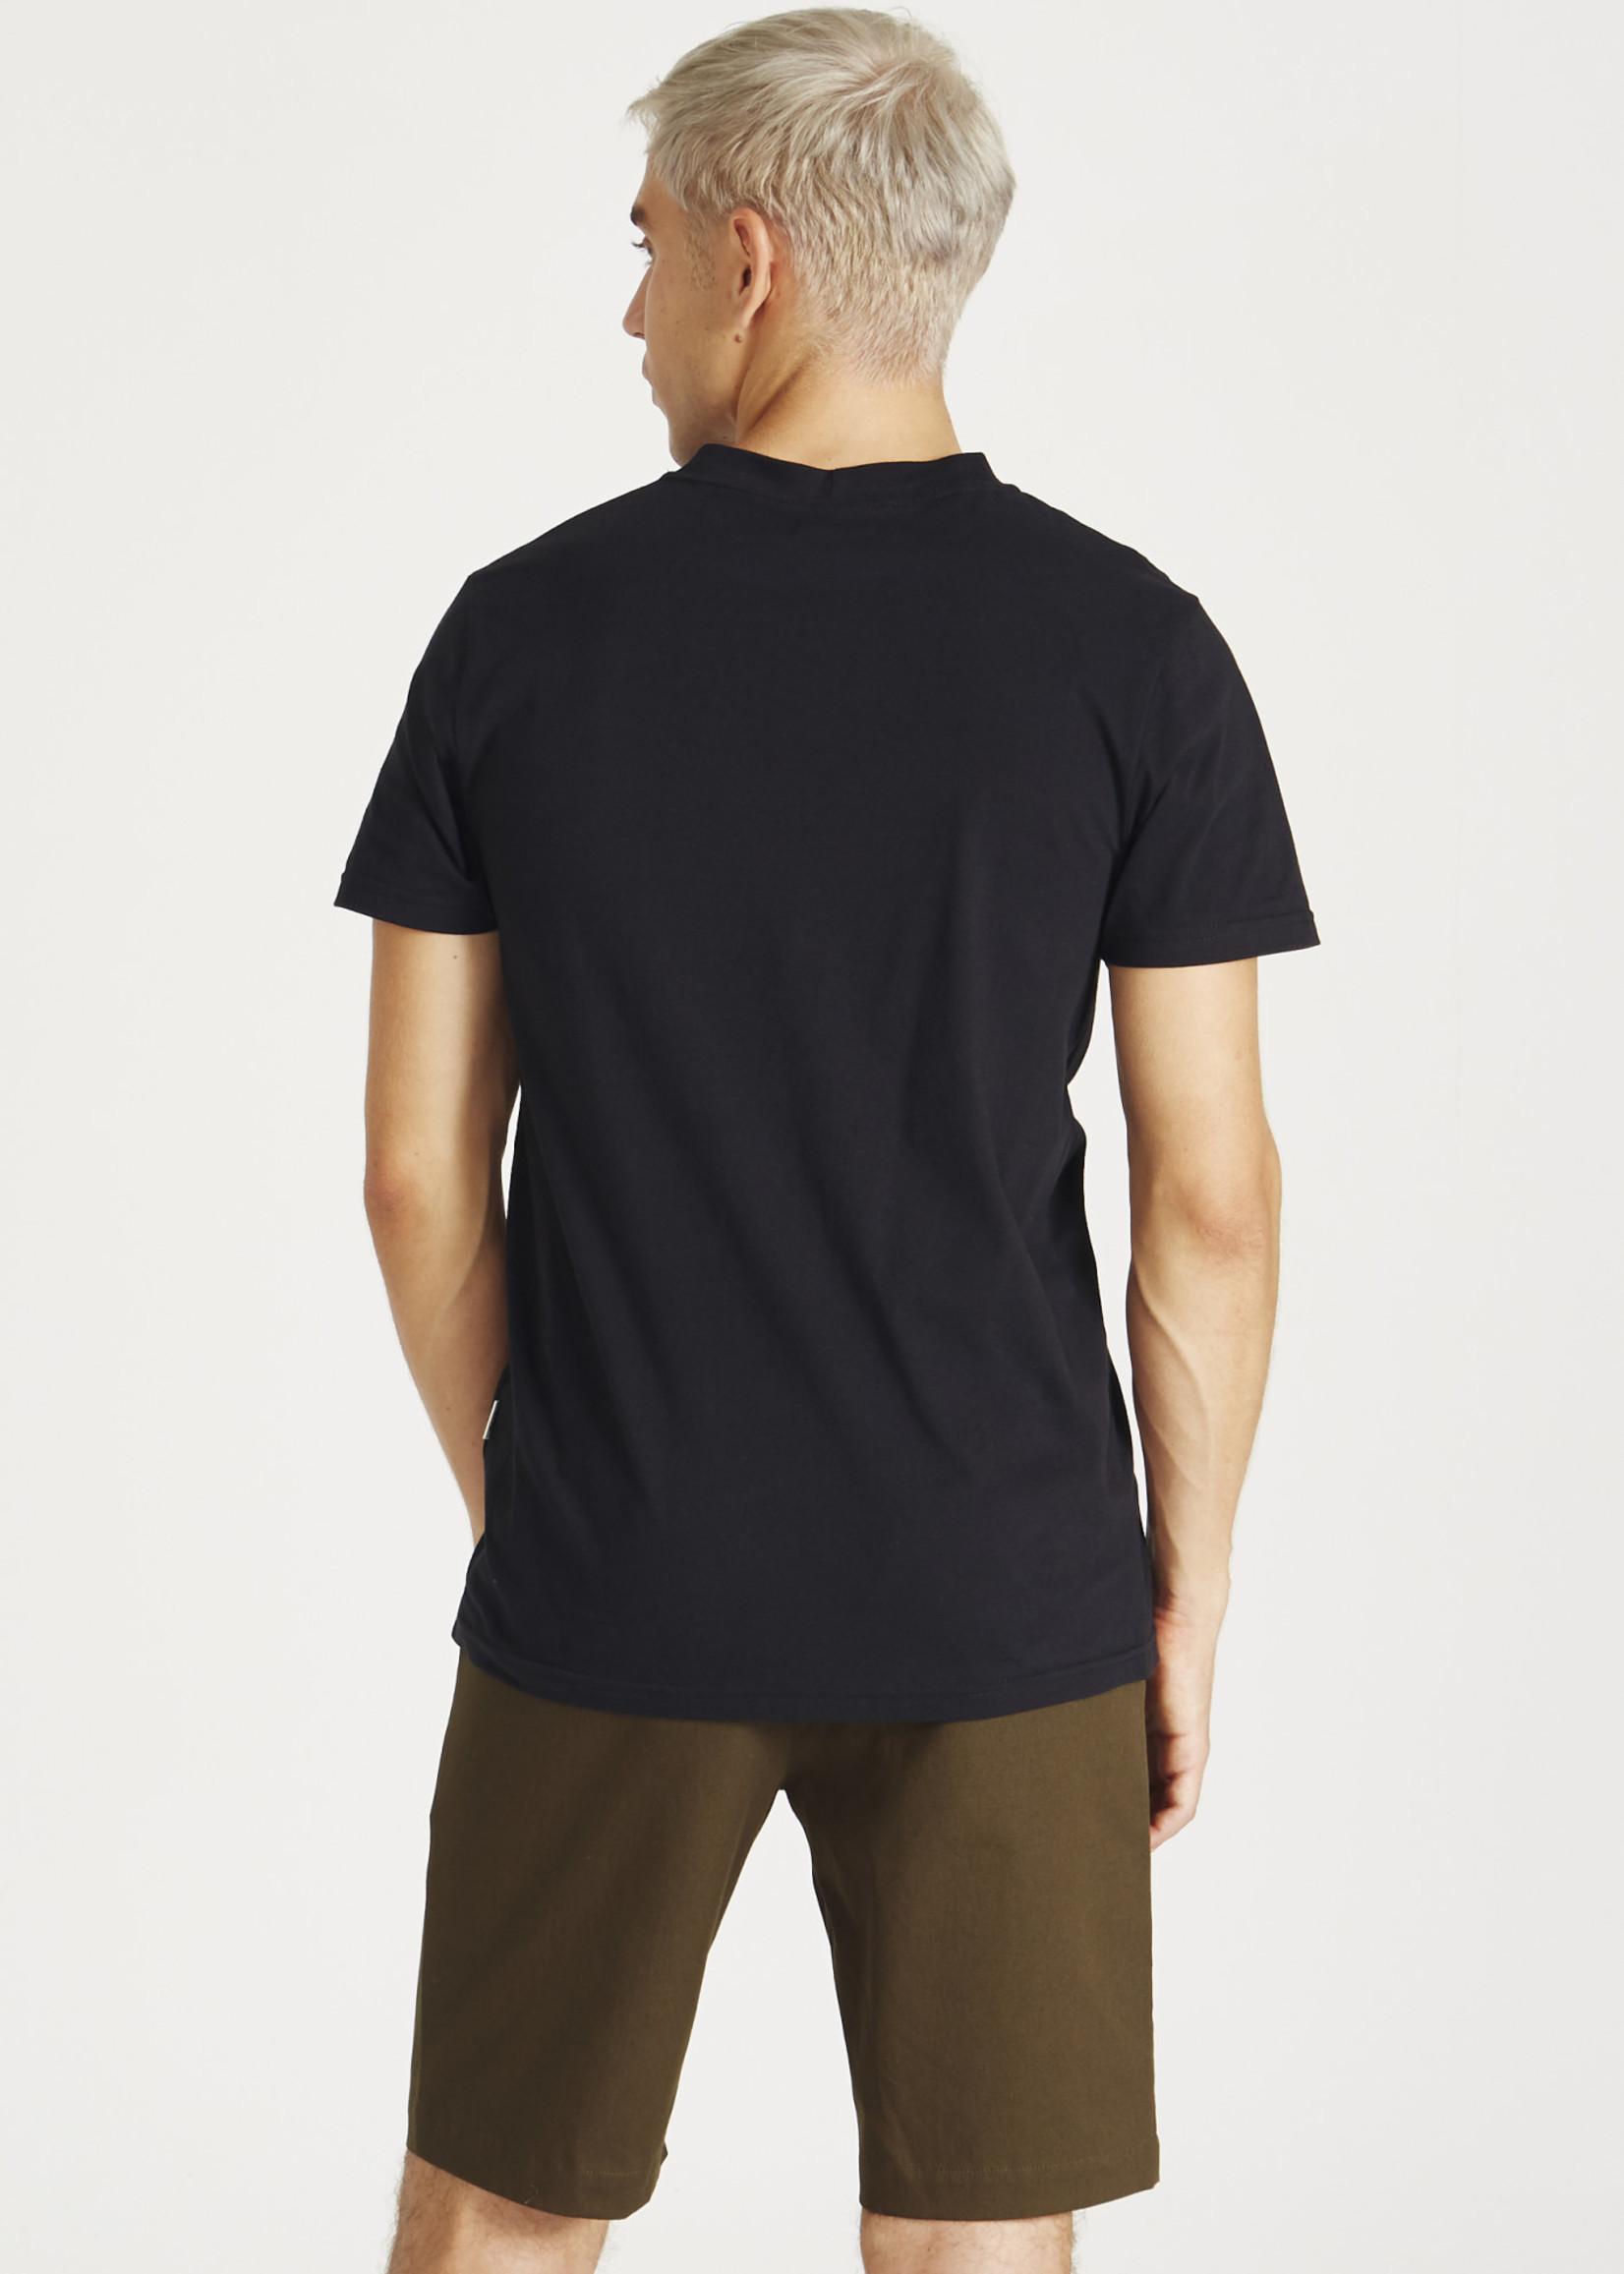 Givn Colby T-shirt (tree print)